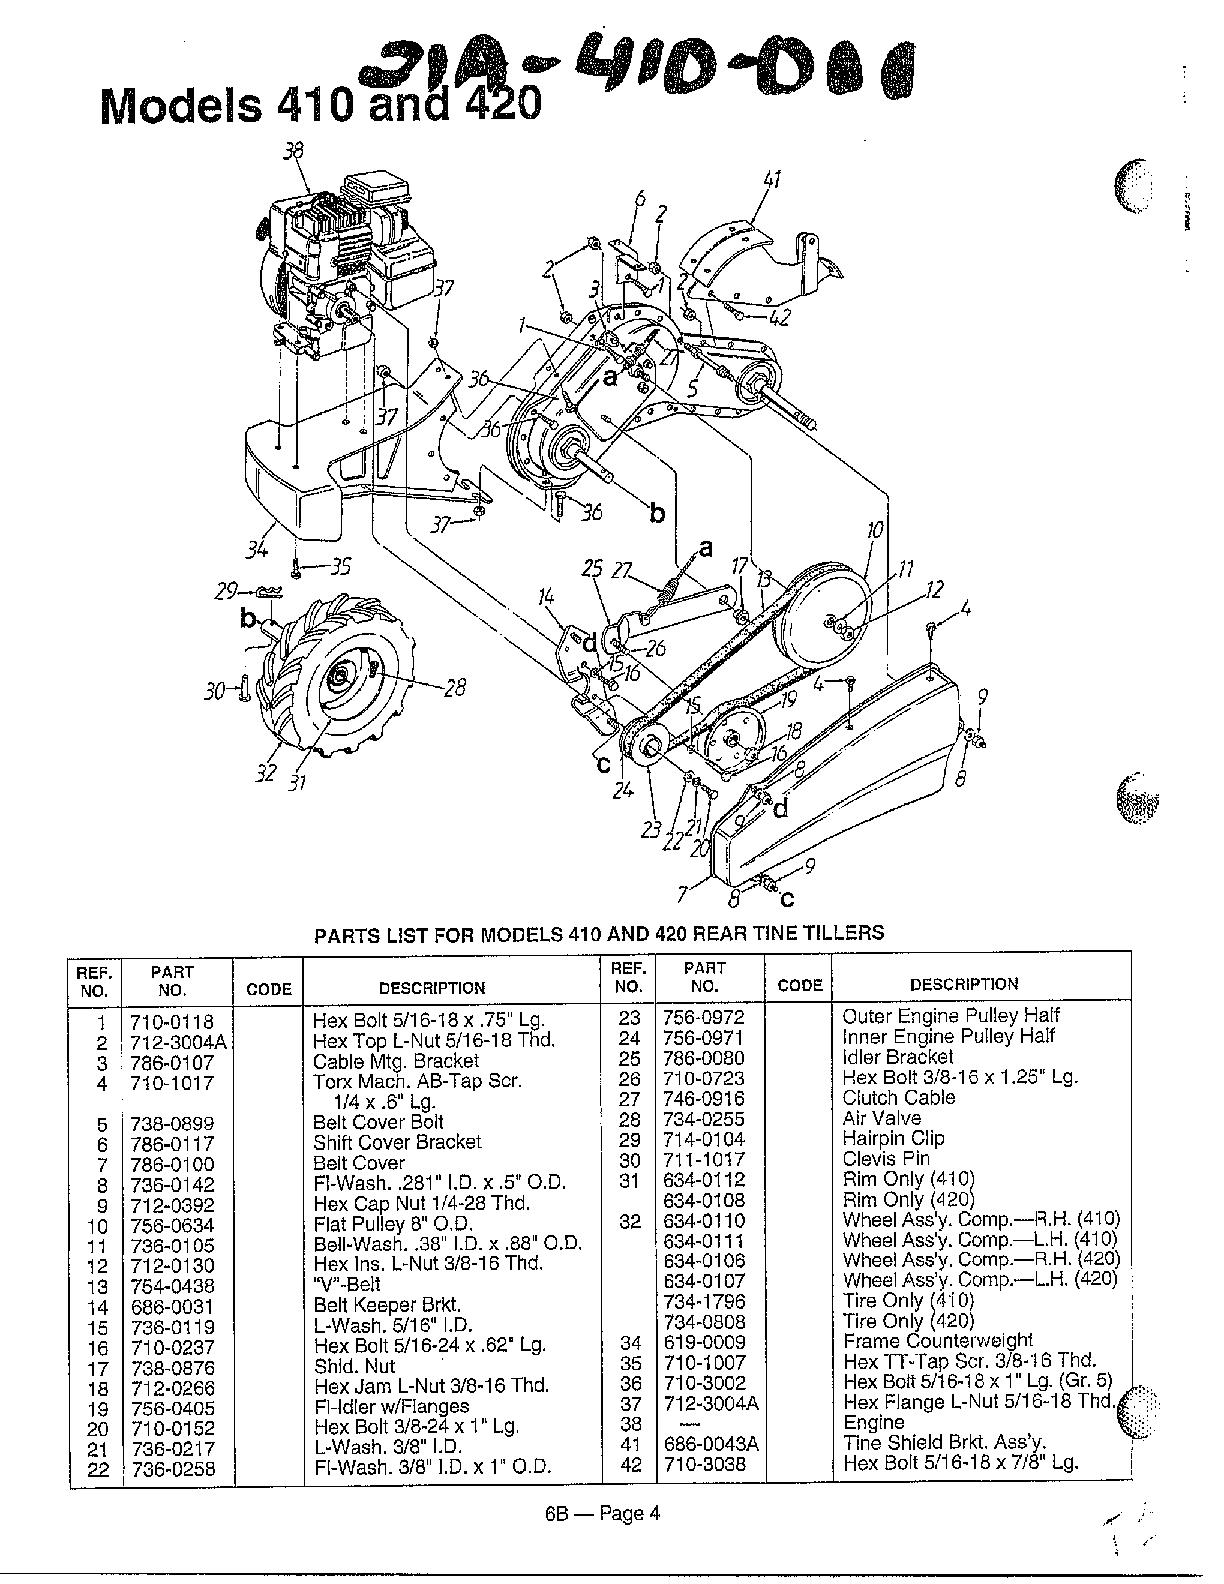 Mtd model 21A-410-000 rear tine, gas tiller genuine parts